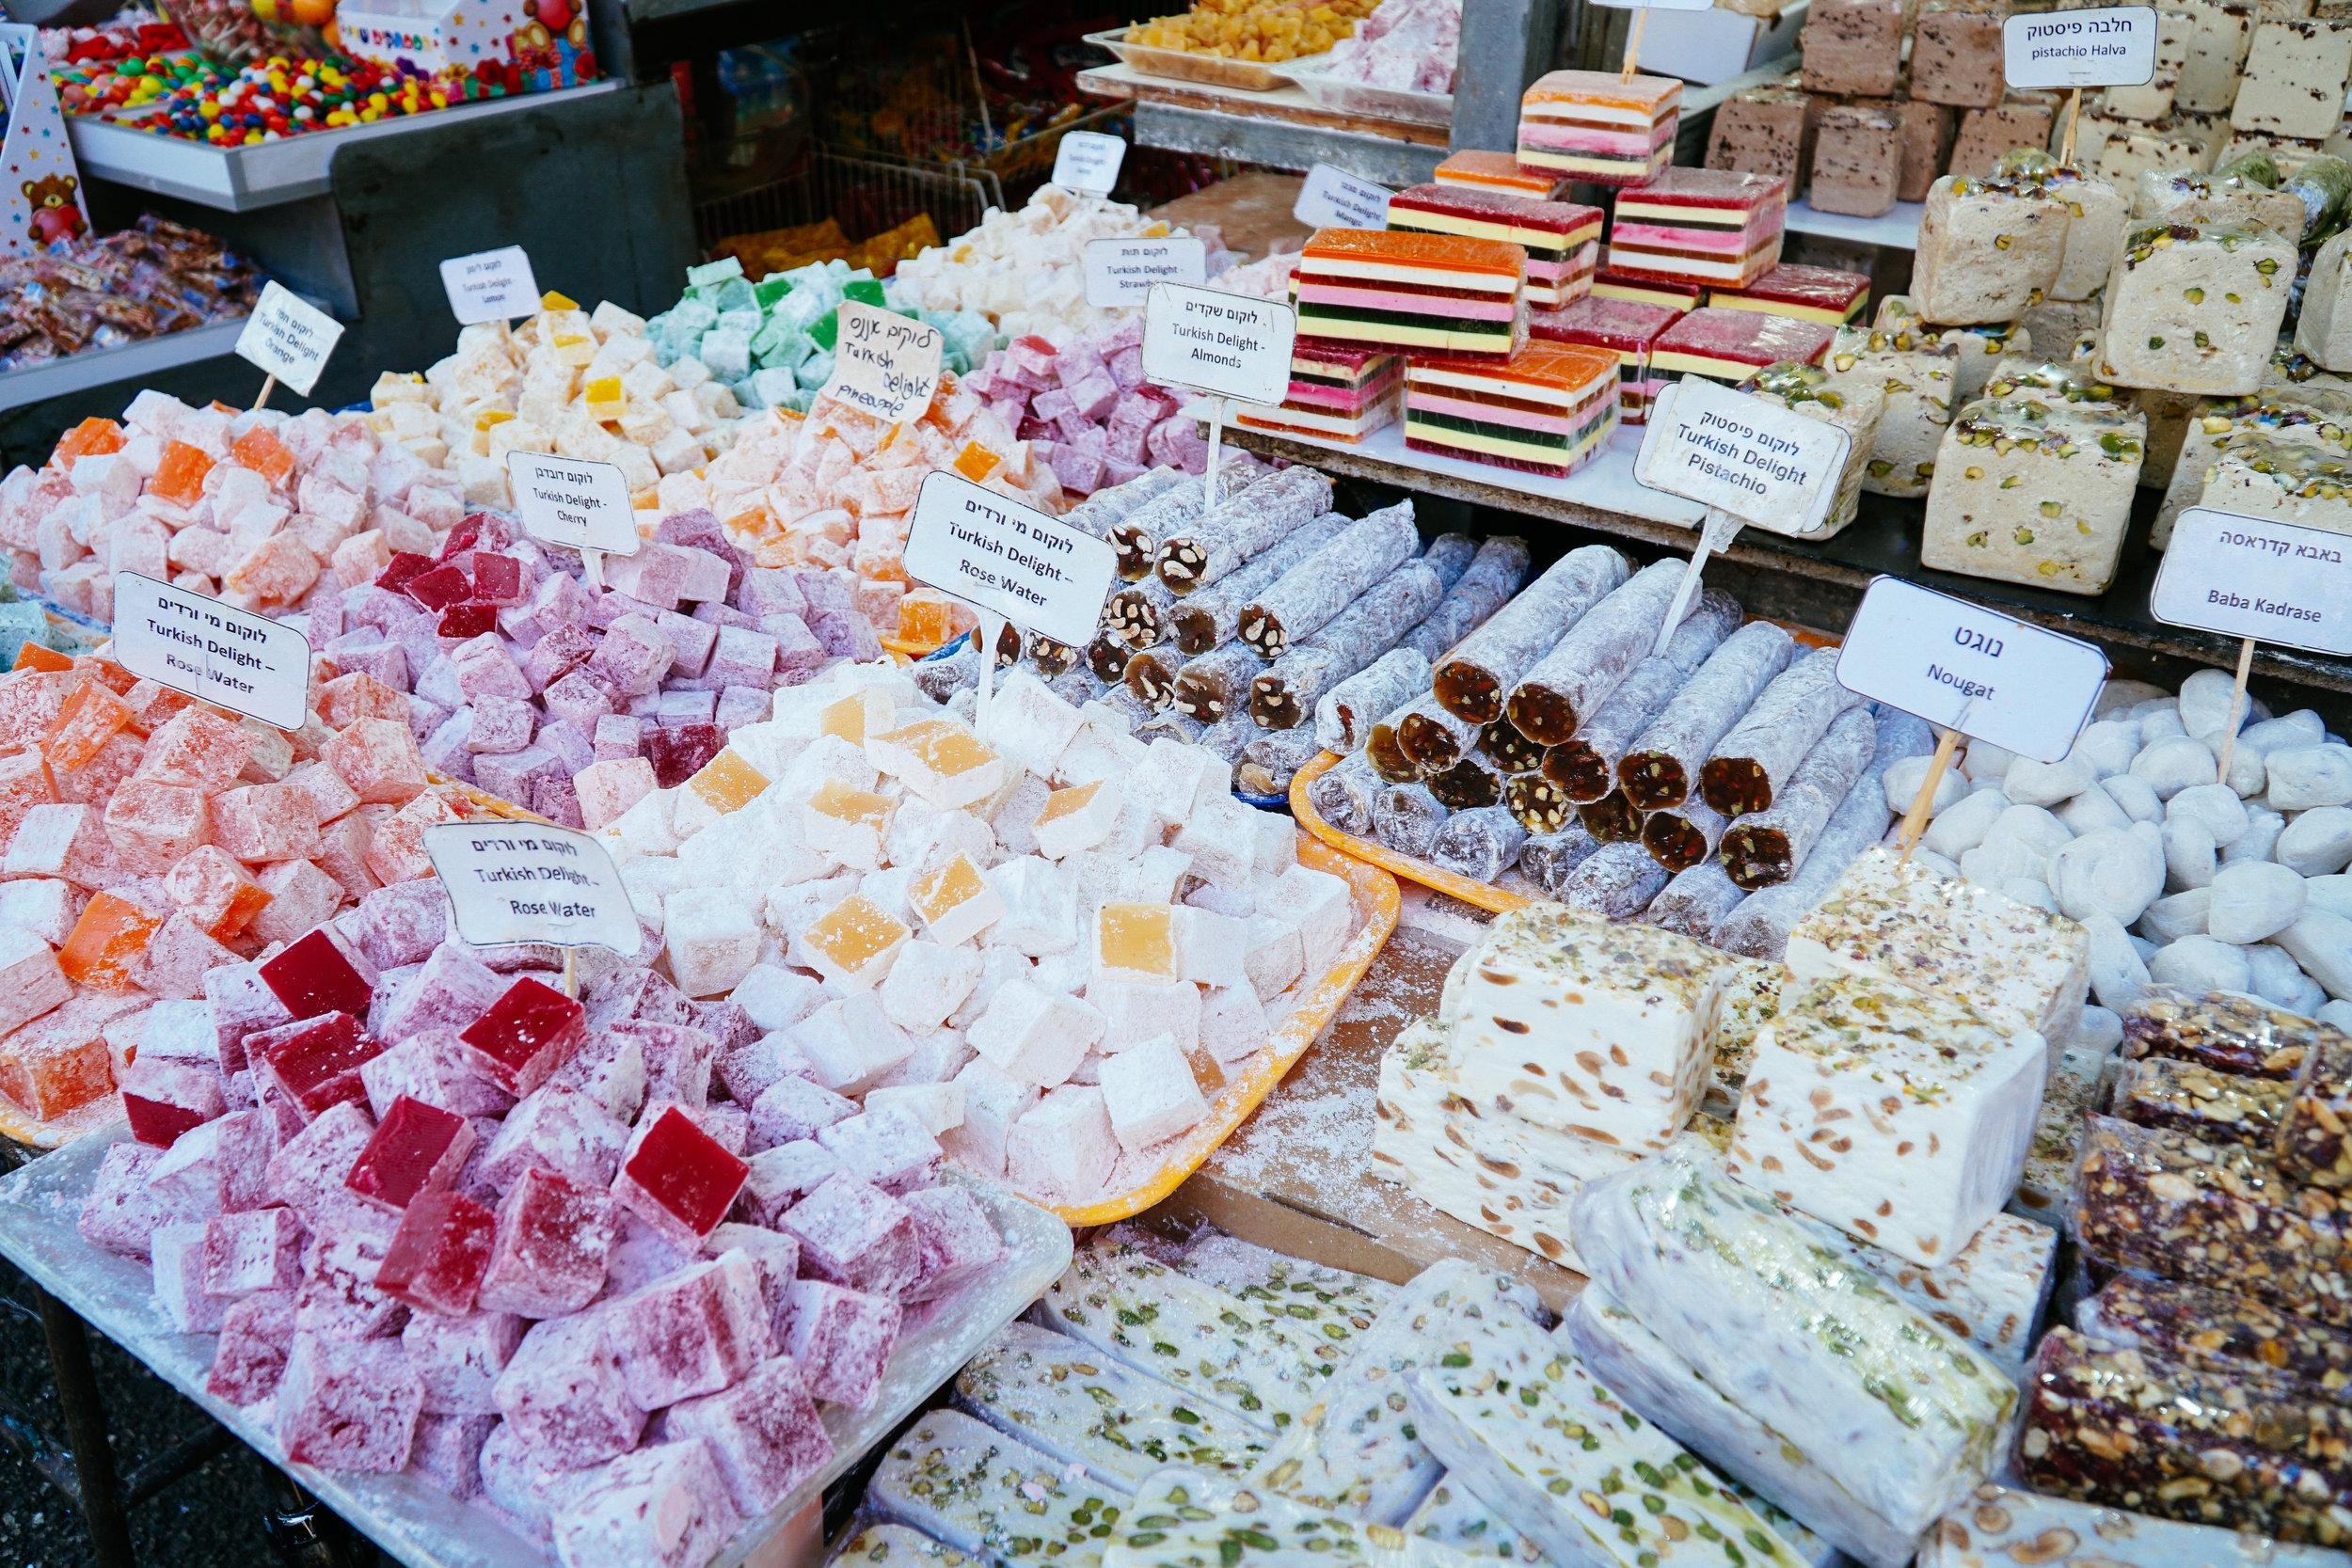 Julia Friedman's Tel Aviv Diary Week 1 at the Hacarmel Market.